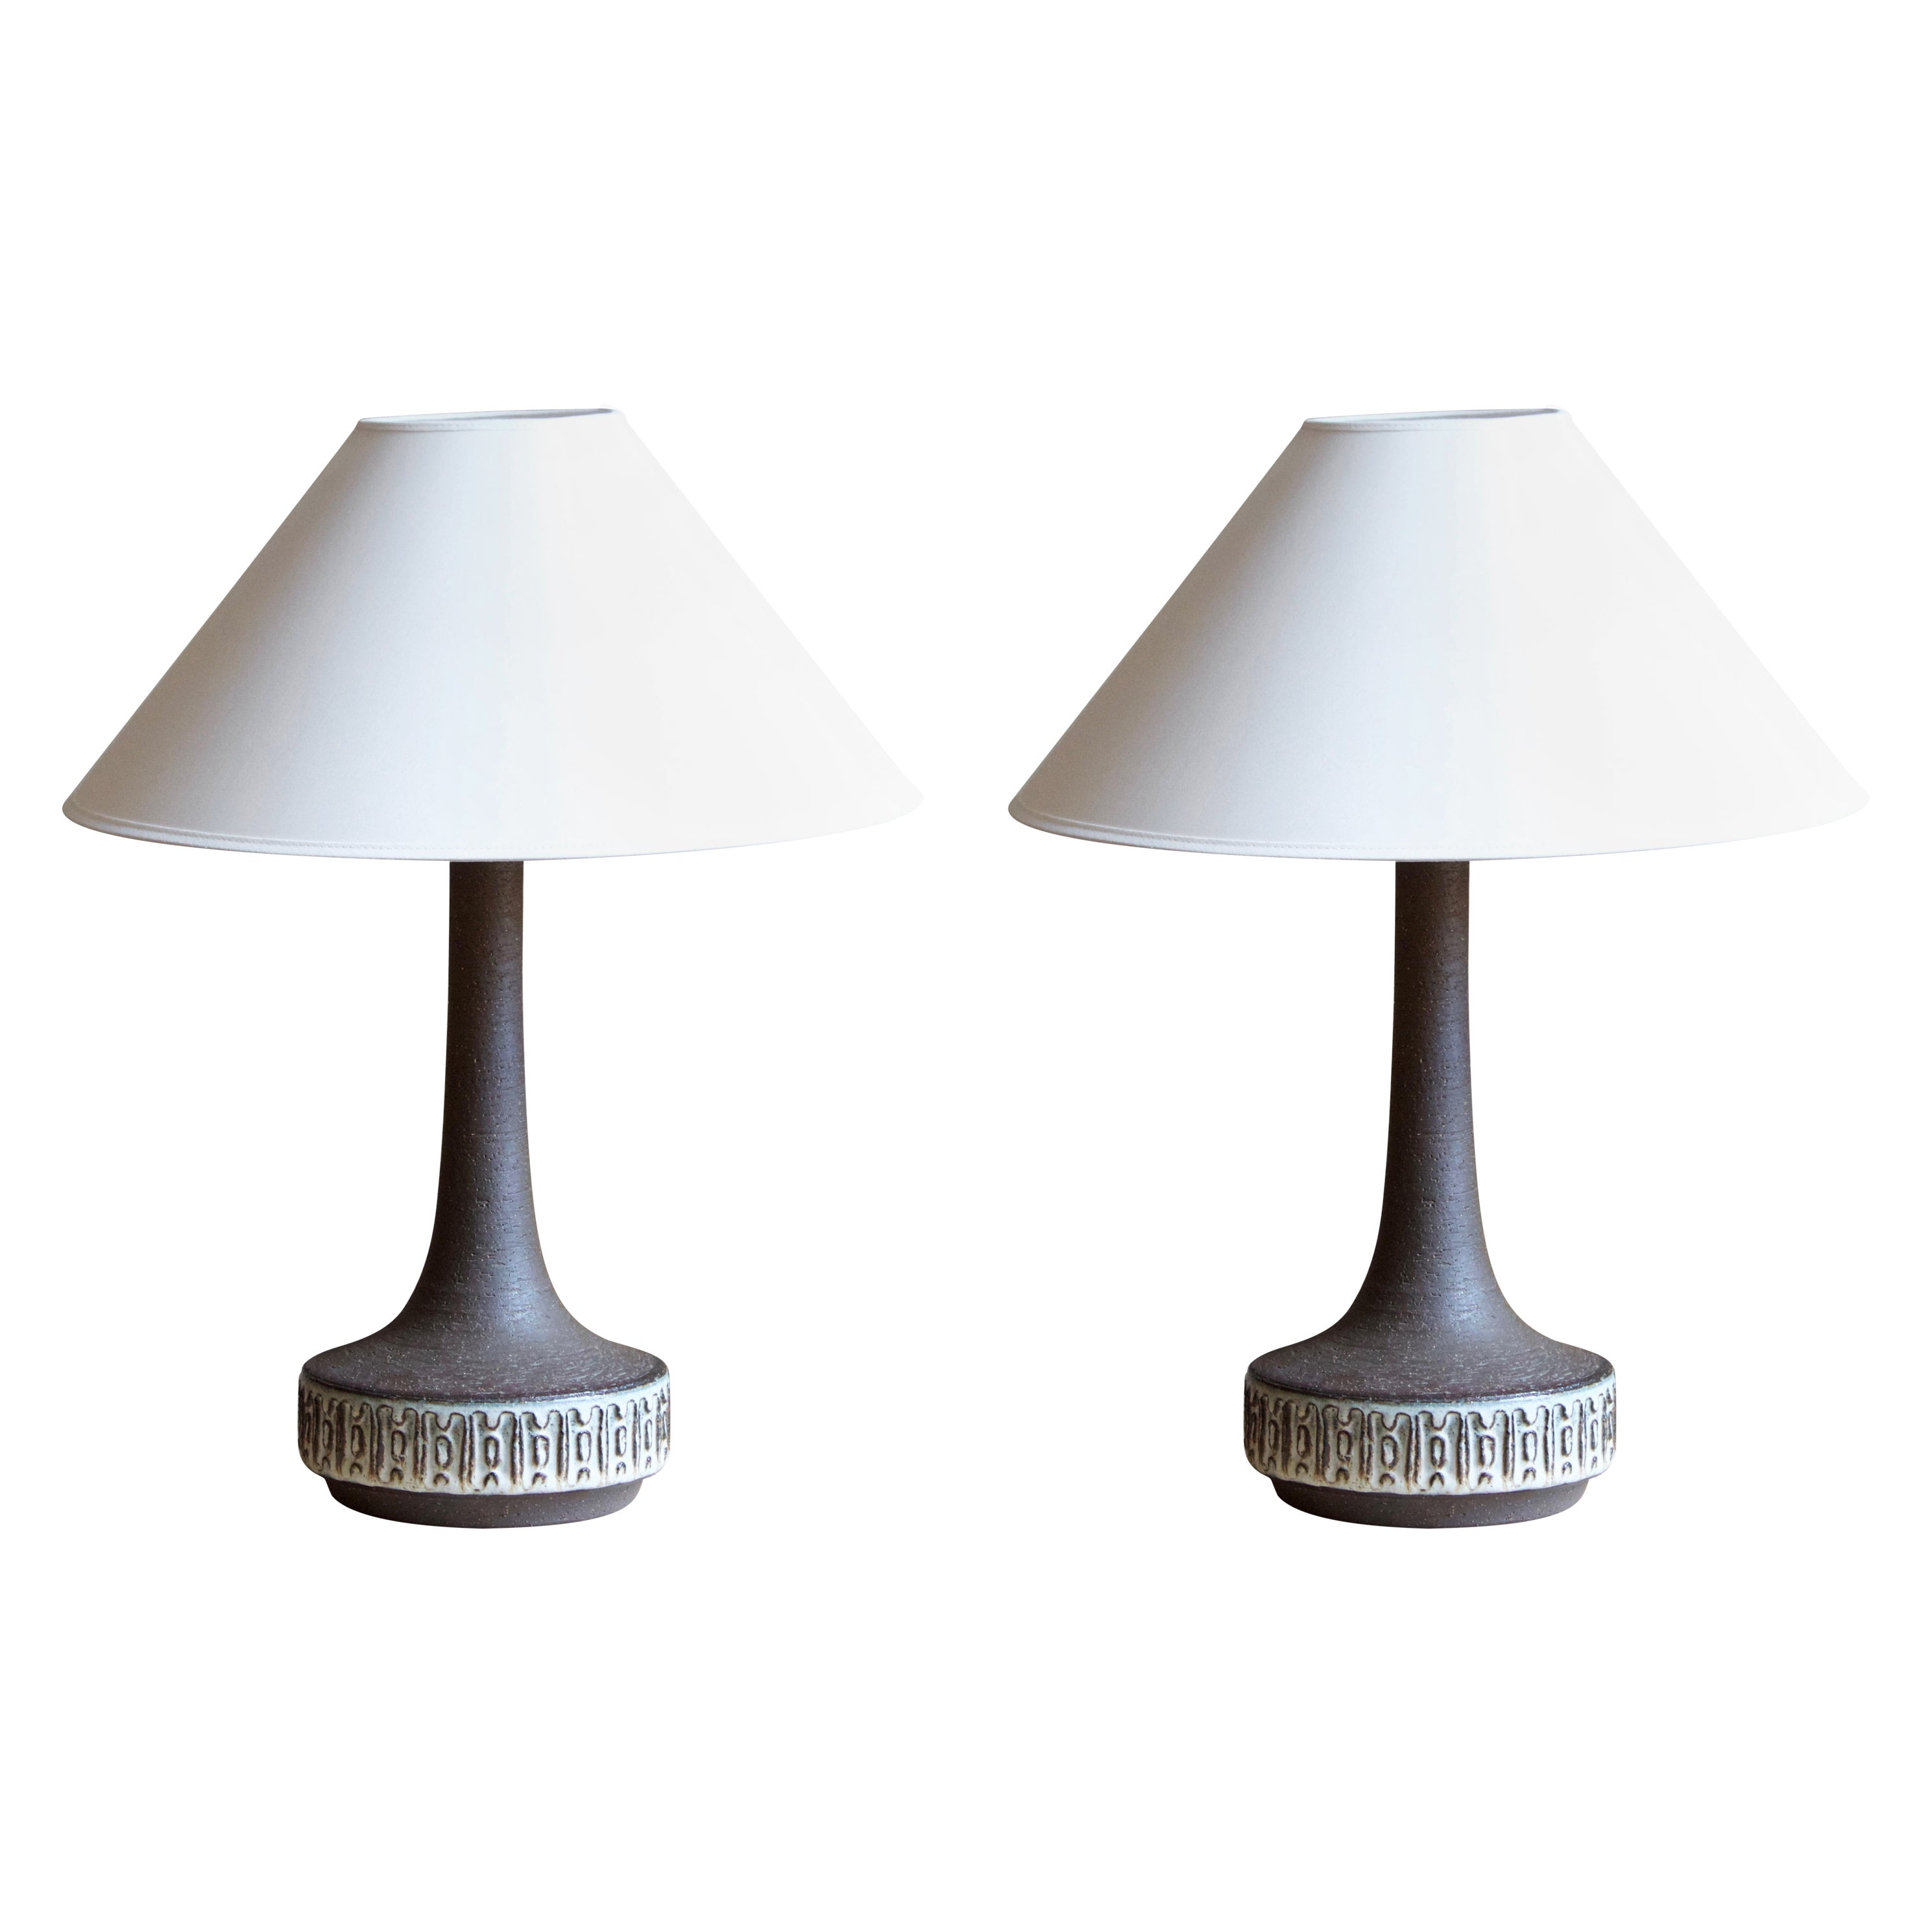 Michael Andersen, Table Lamps, Glazed Stoneware, Bornholm, Denmark, 1960s